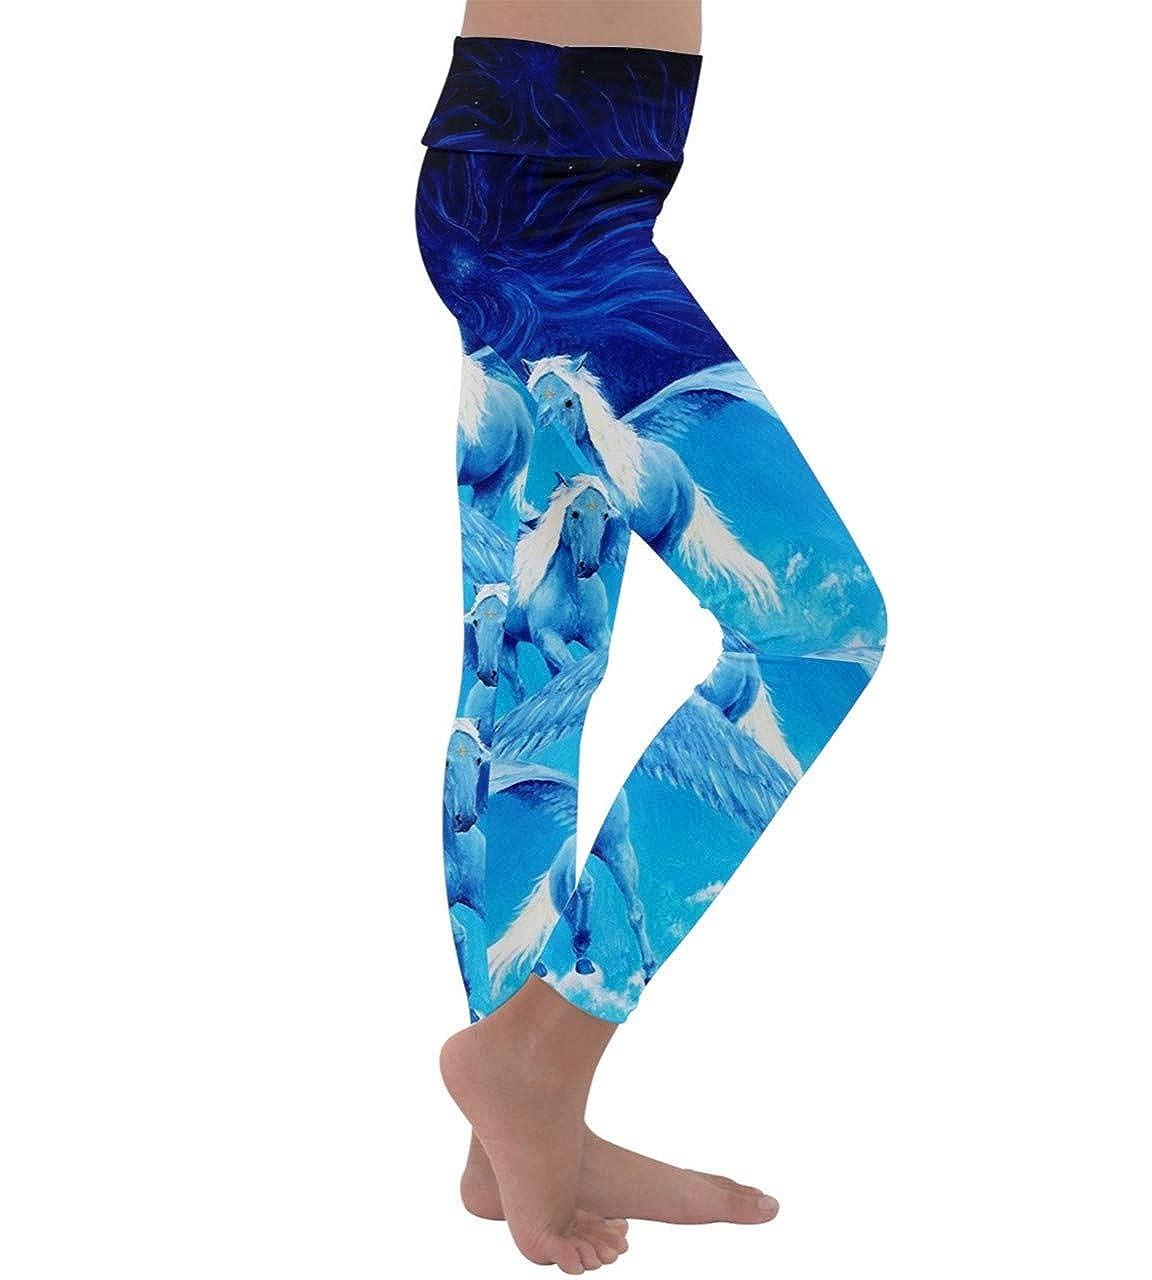 d581a3b1b Amazon.com: PattyCandy Big Little Girls Soft Tights Fierce Lion Face Animal  Prints Kids Lightweight Velour Yoga Leggings: Clothing